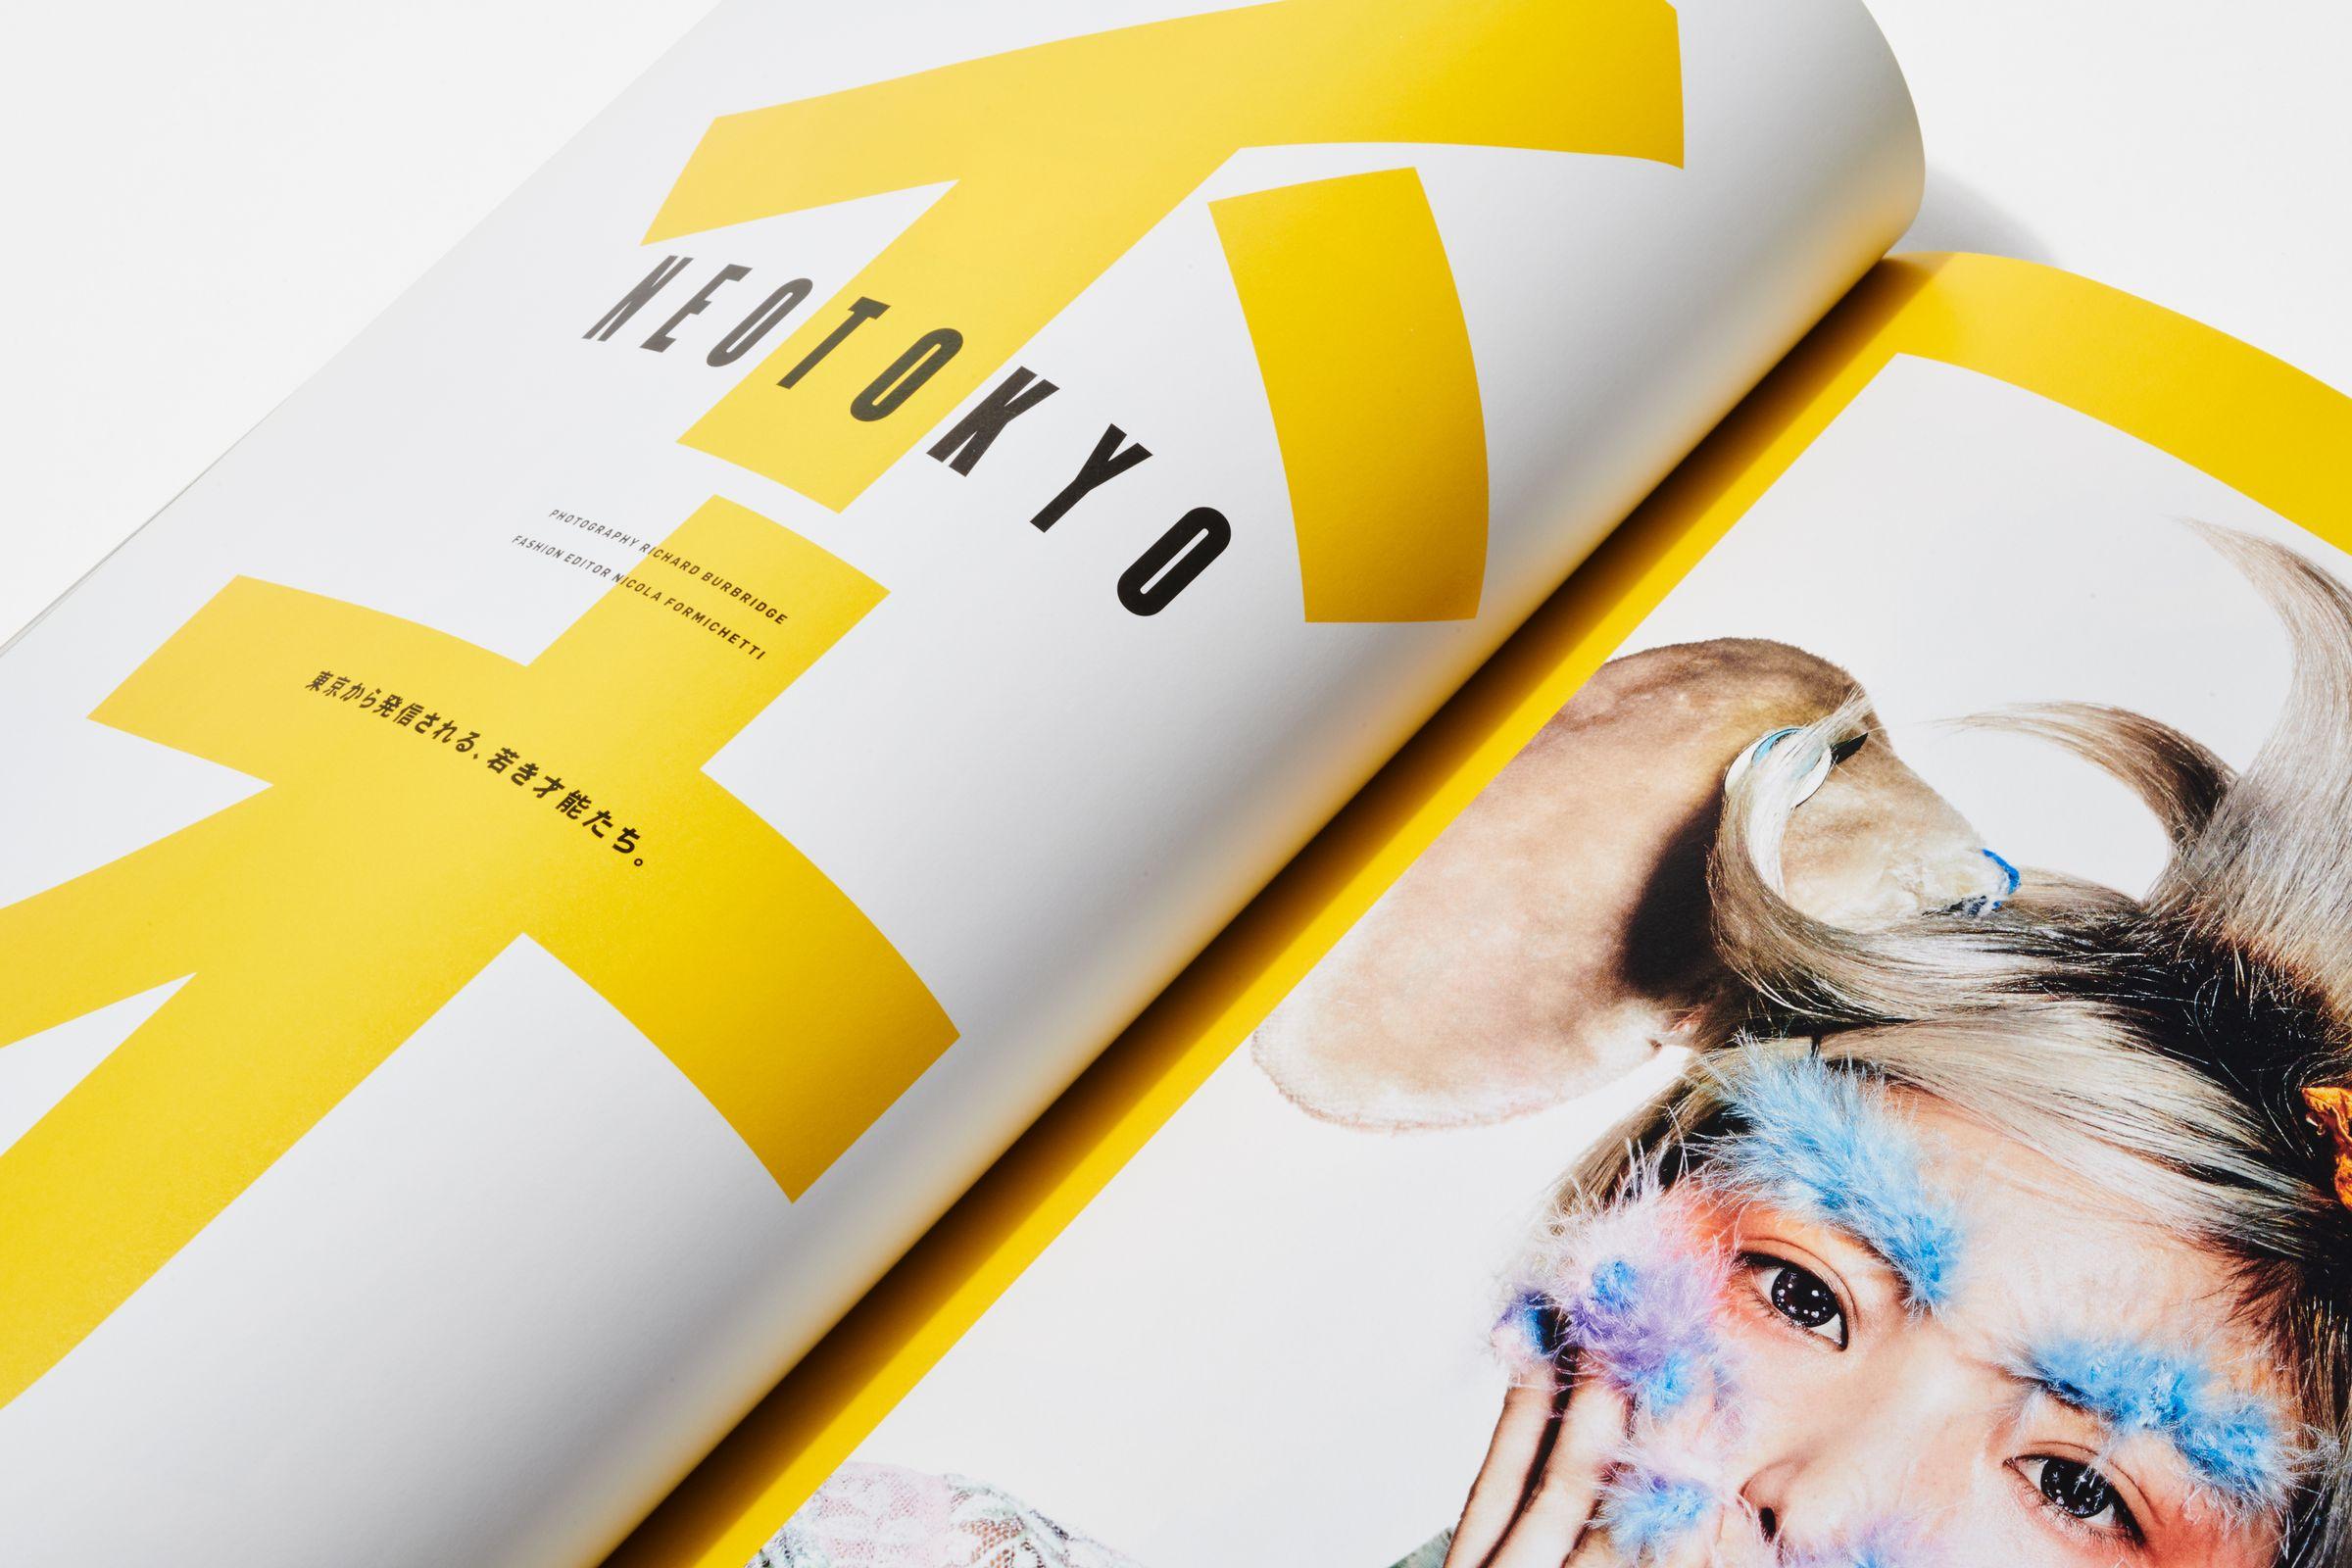 FREE Magazine spread layout